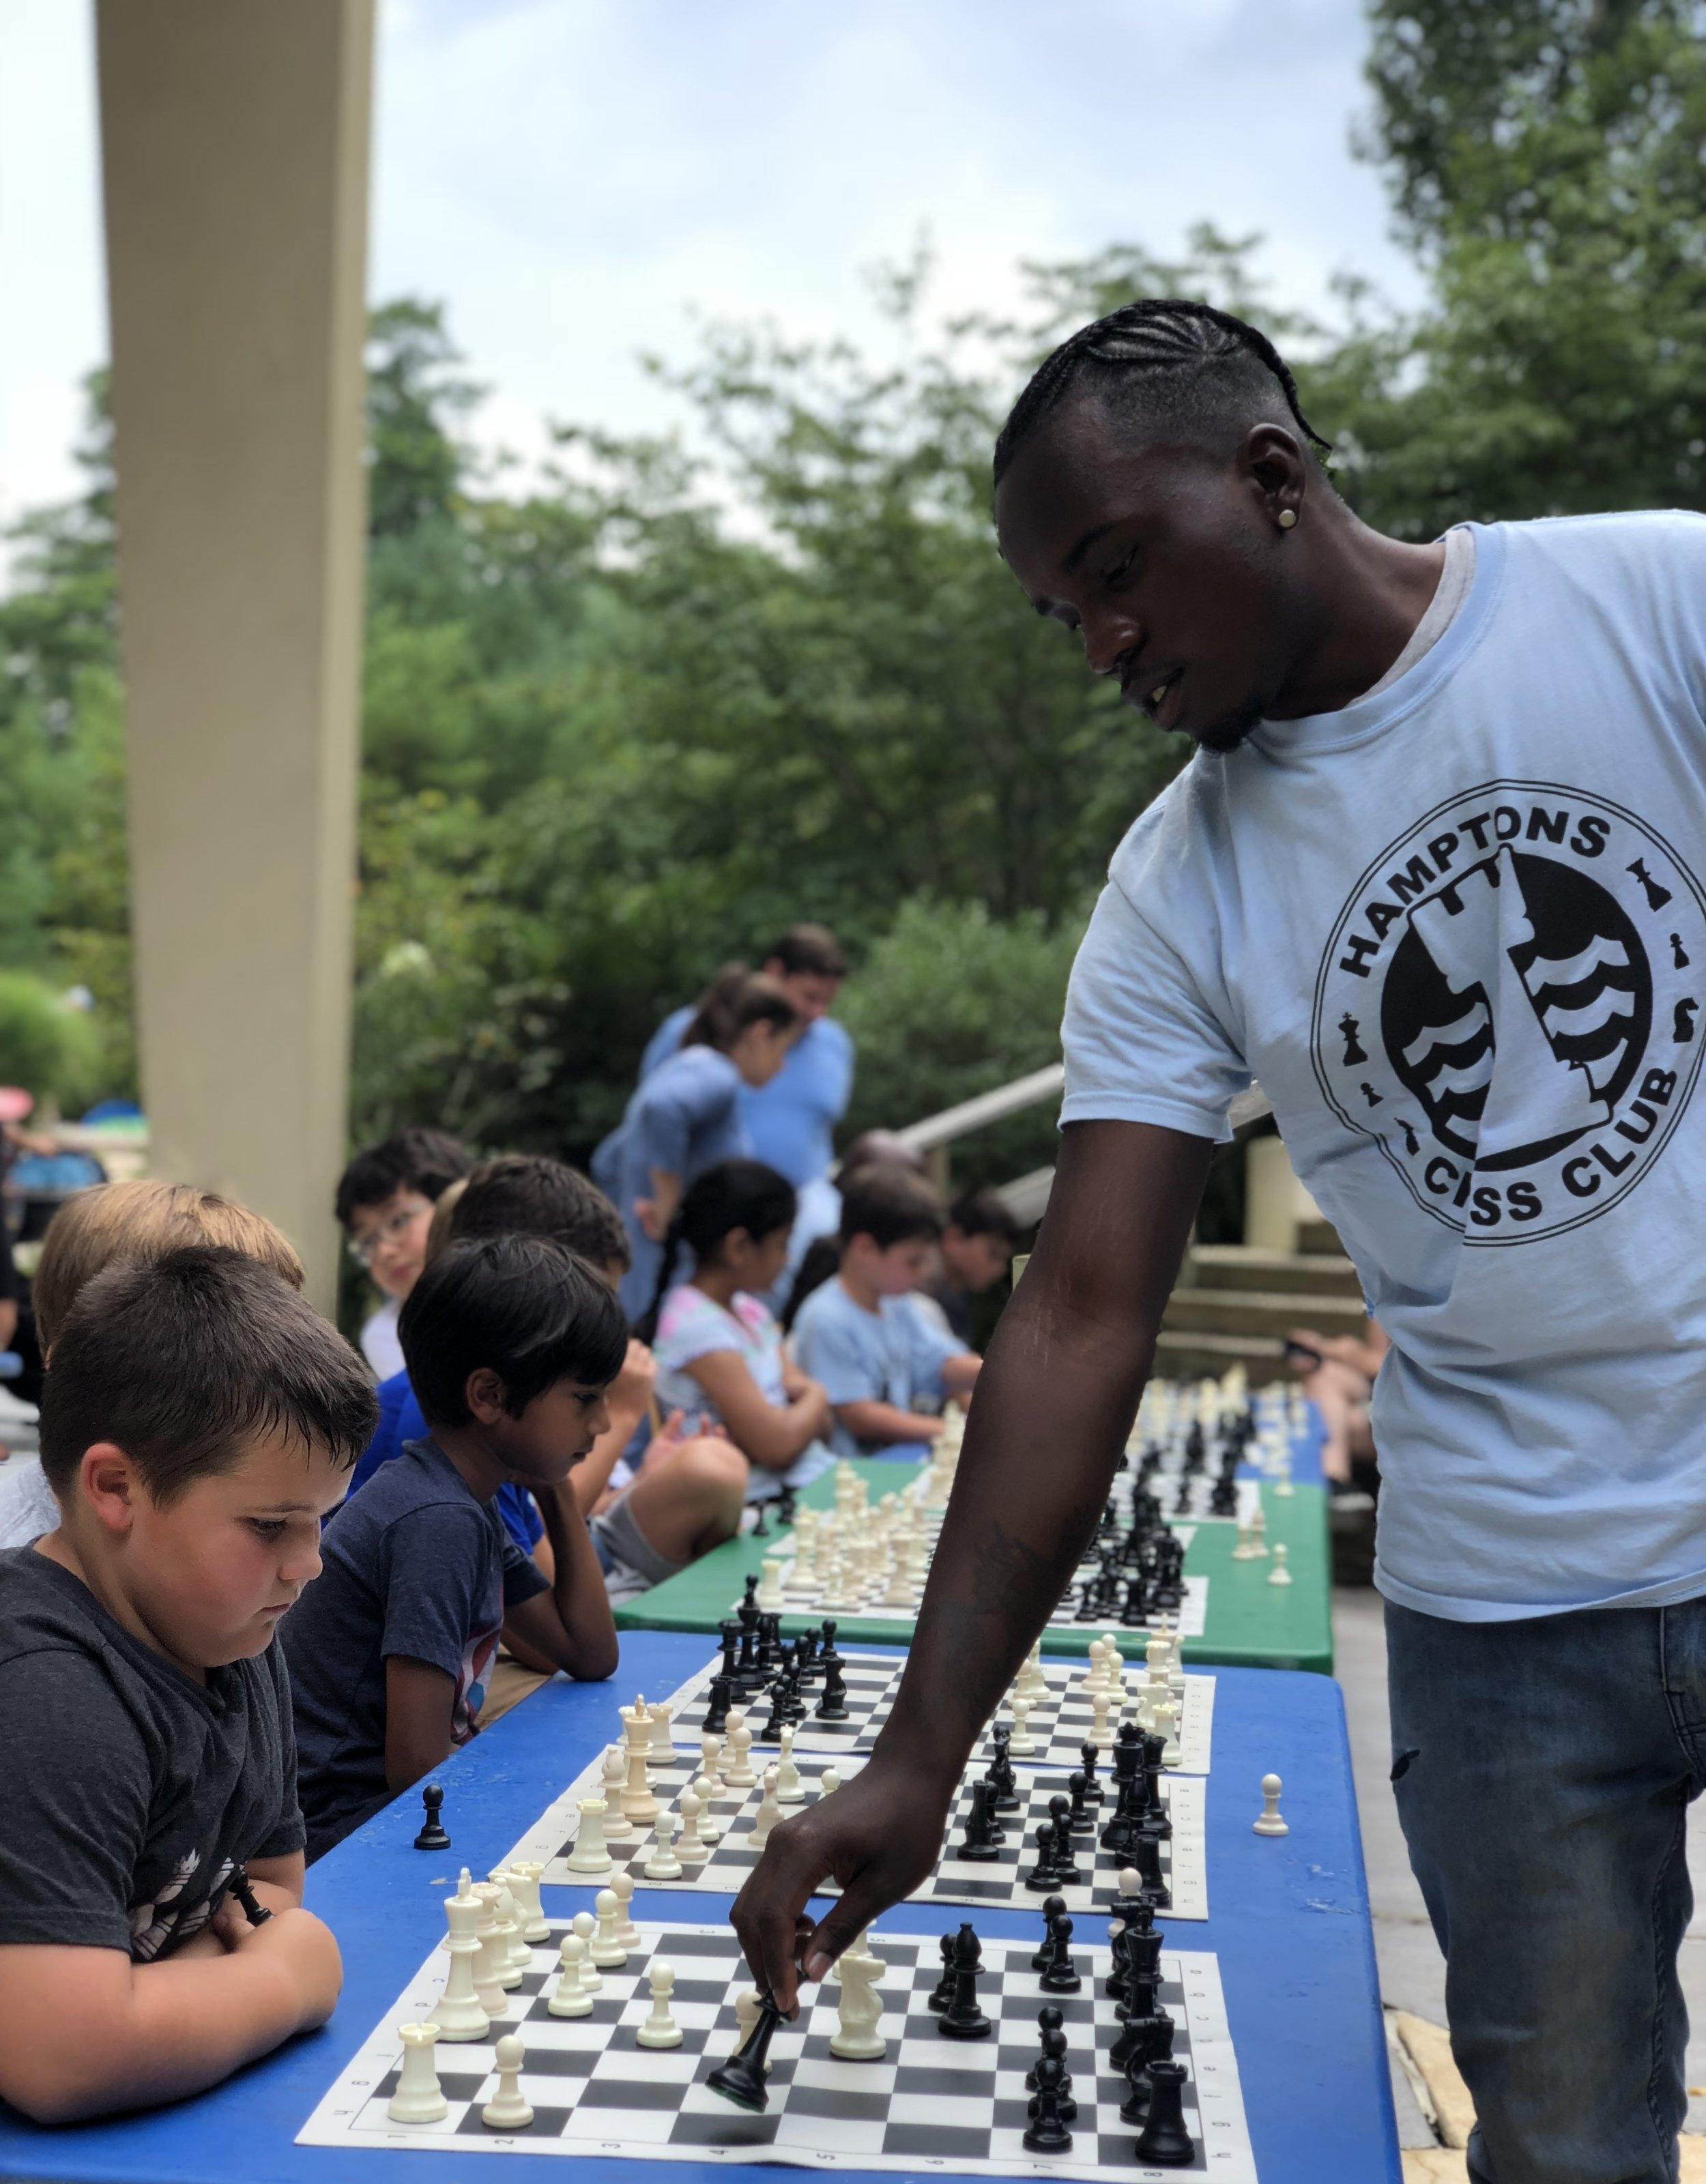 Hamptons Chess